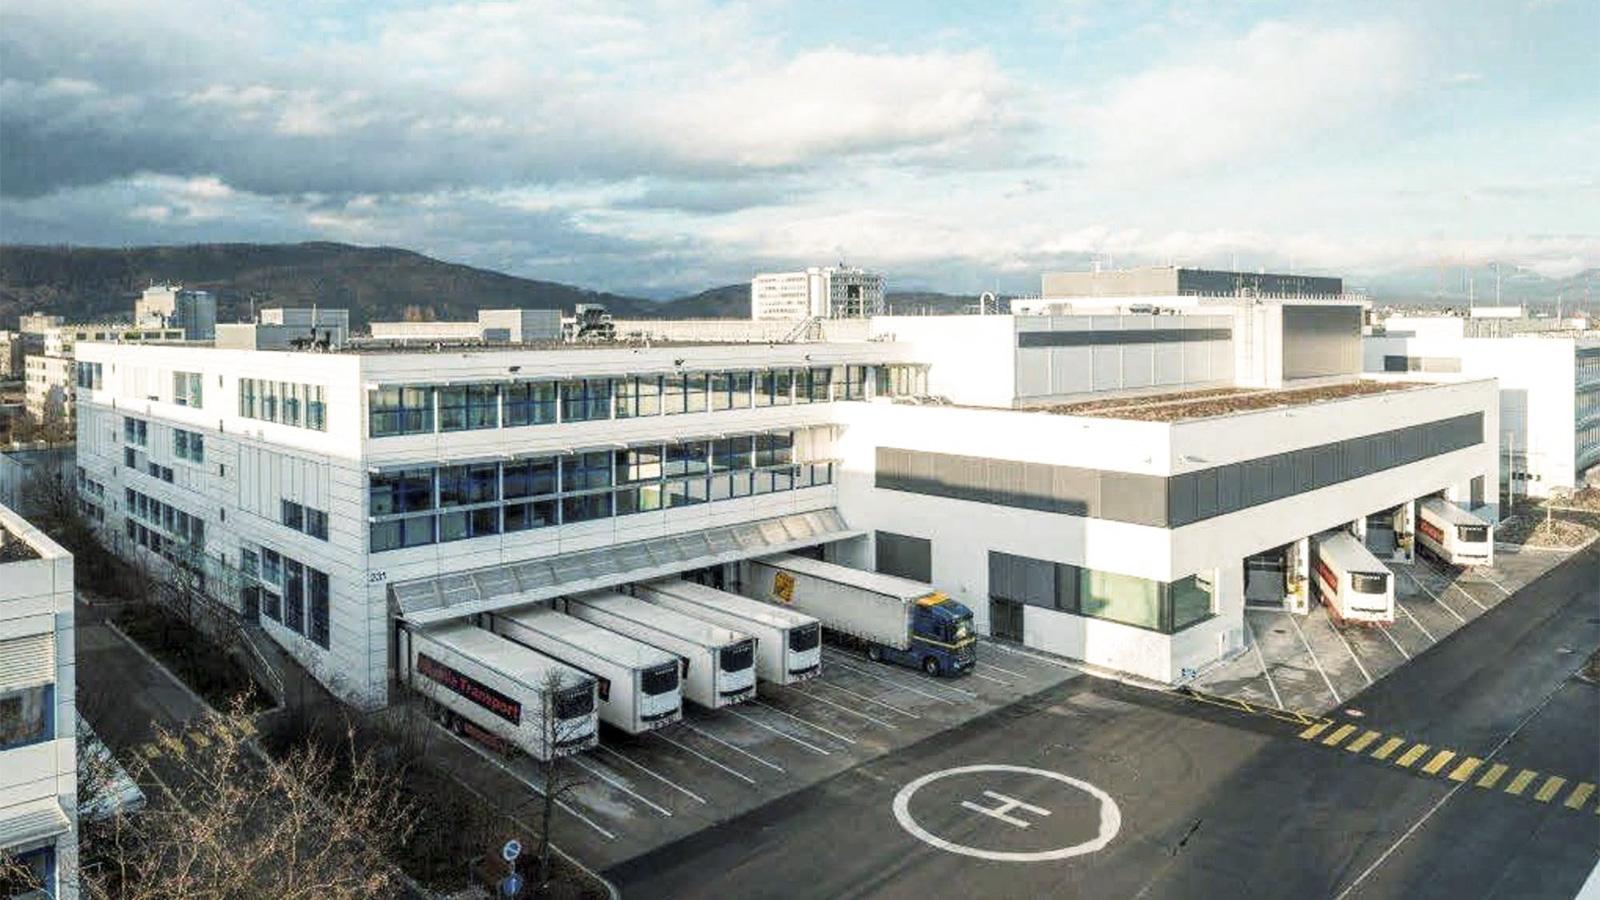 Hoffmann-La Roche pharmaceutical warehouse | Swisslog